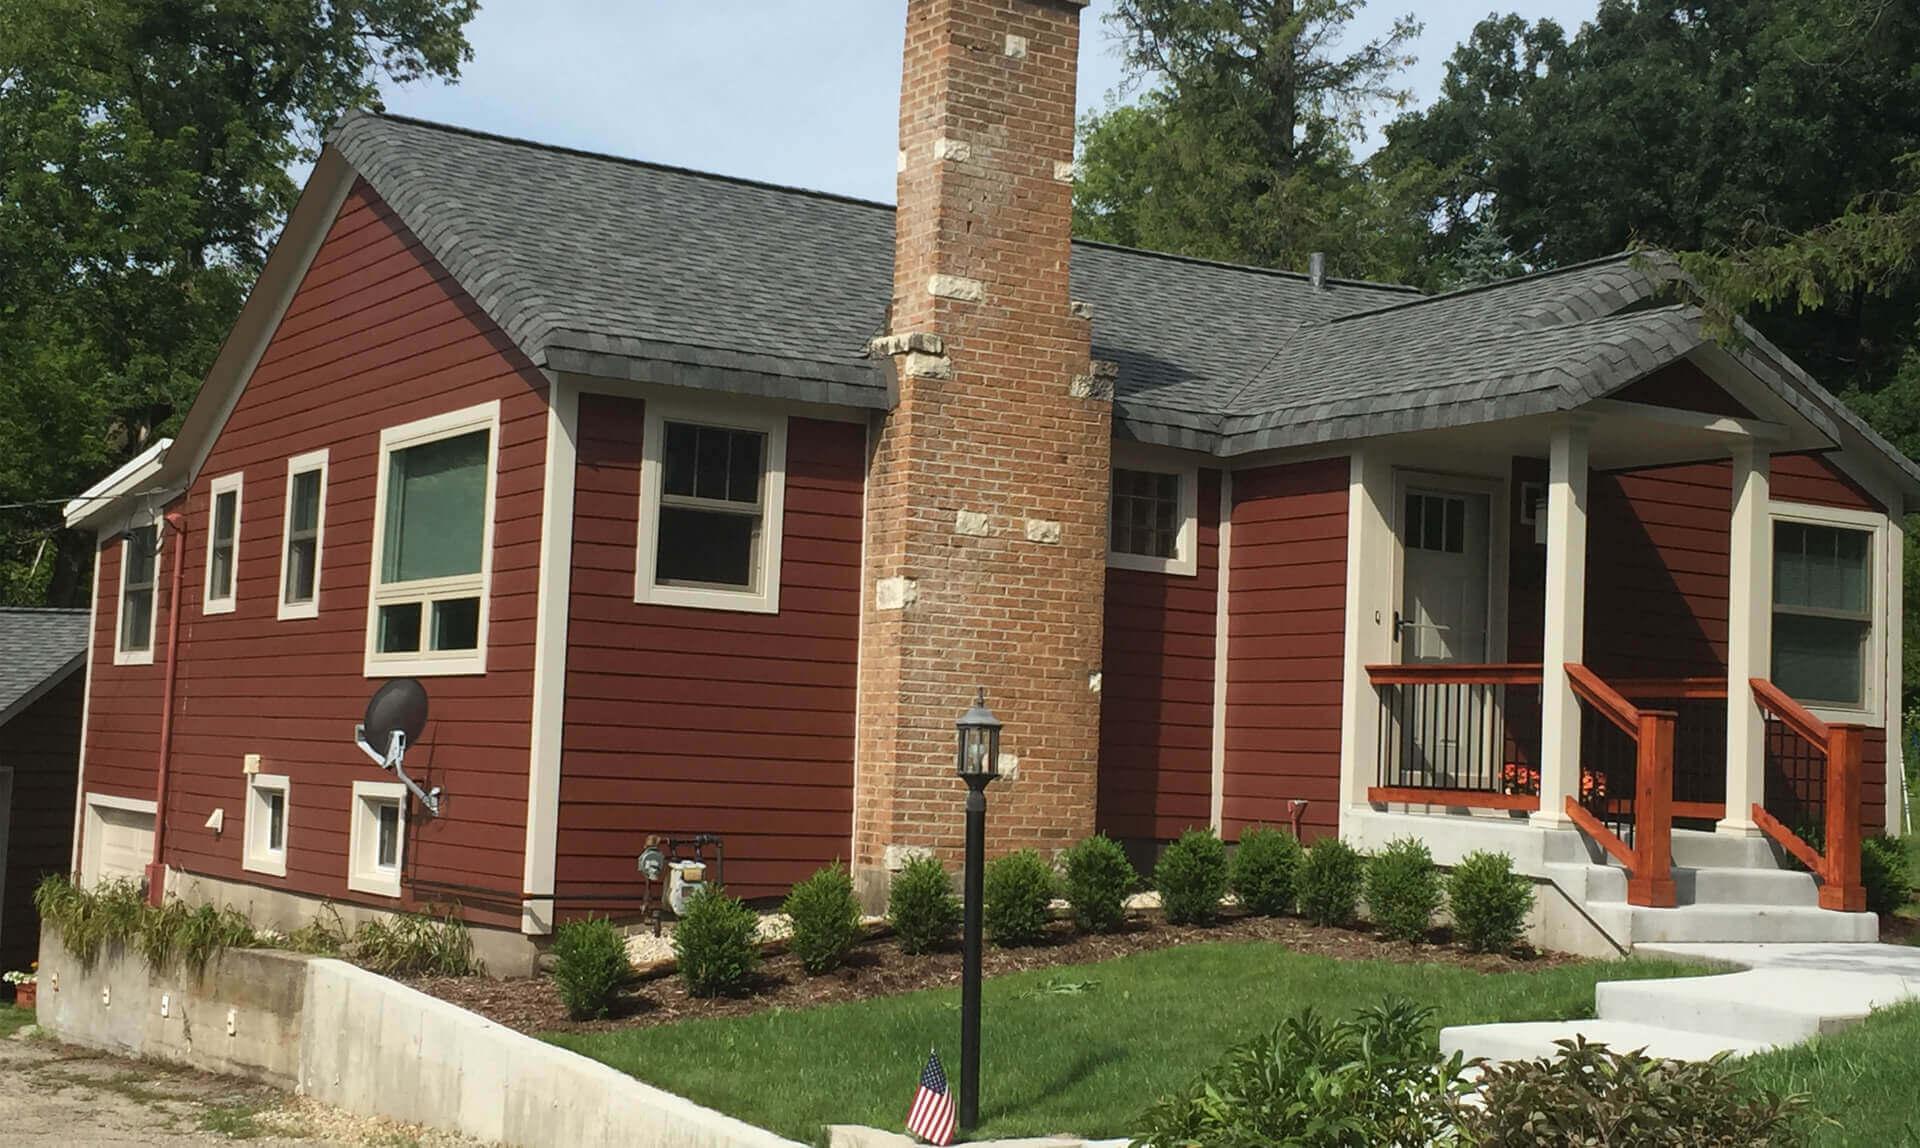 Algonquin exterior remodel erdmann exteriors construction for Exterior remodeling specialists